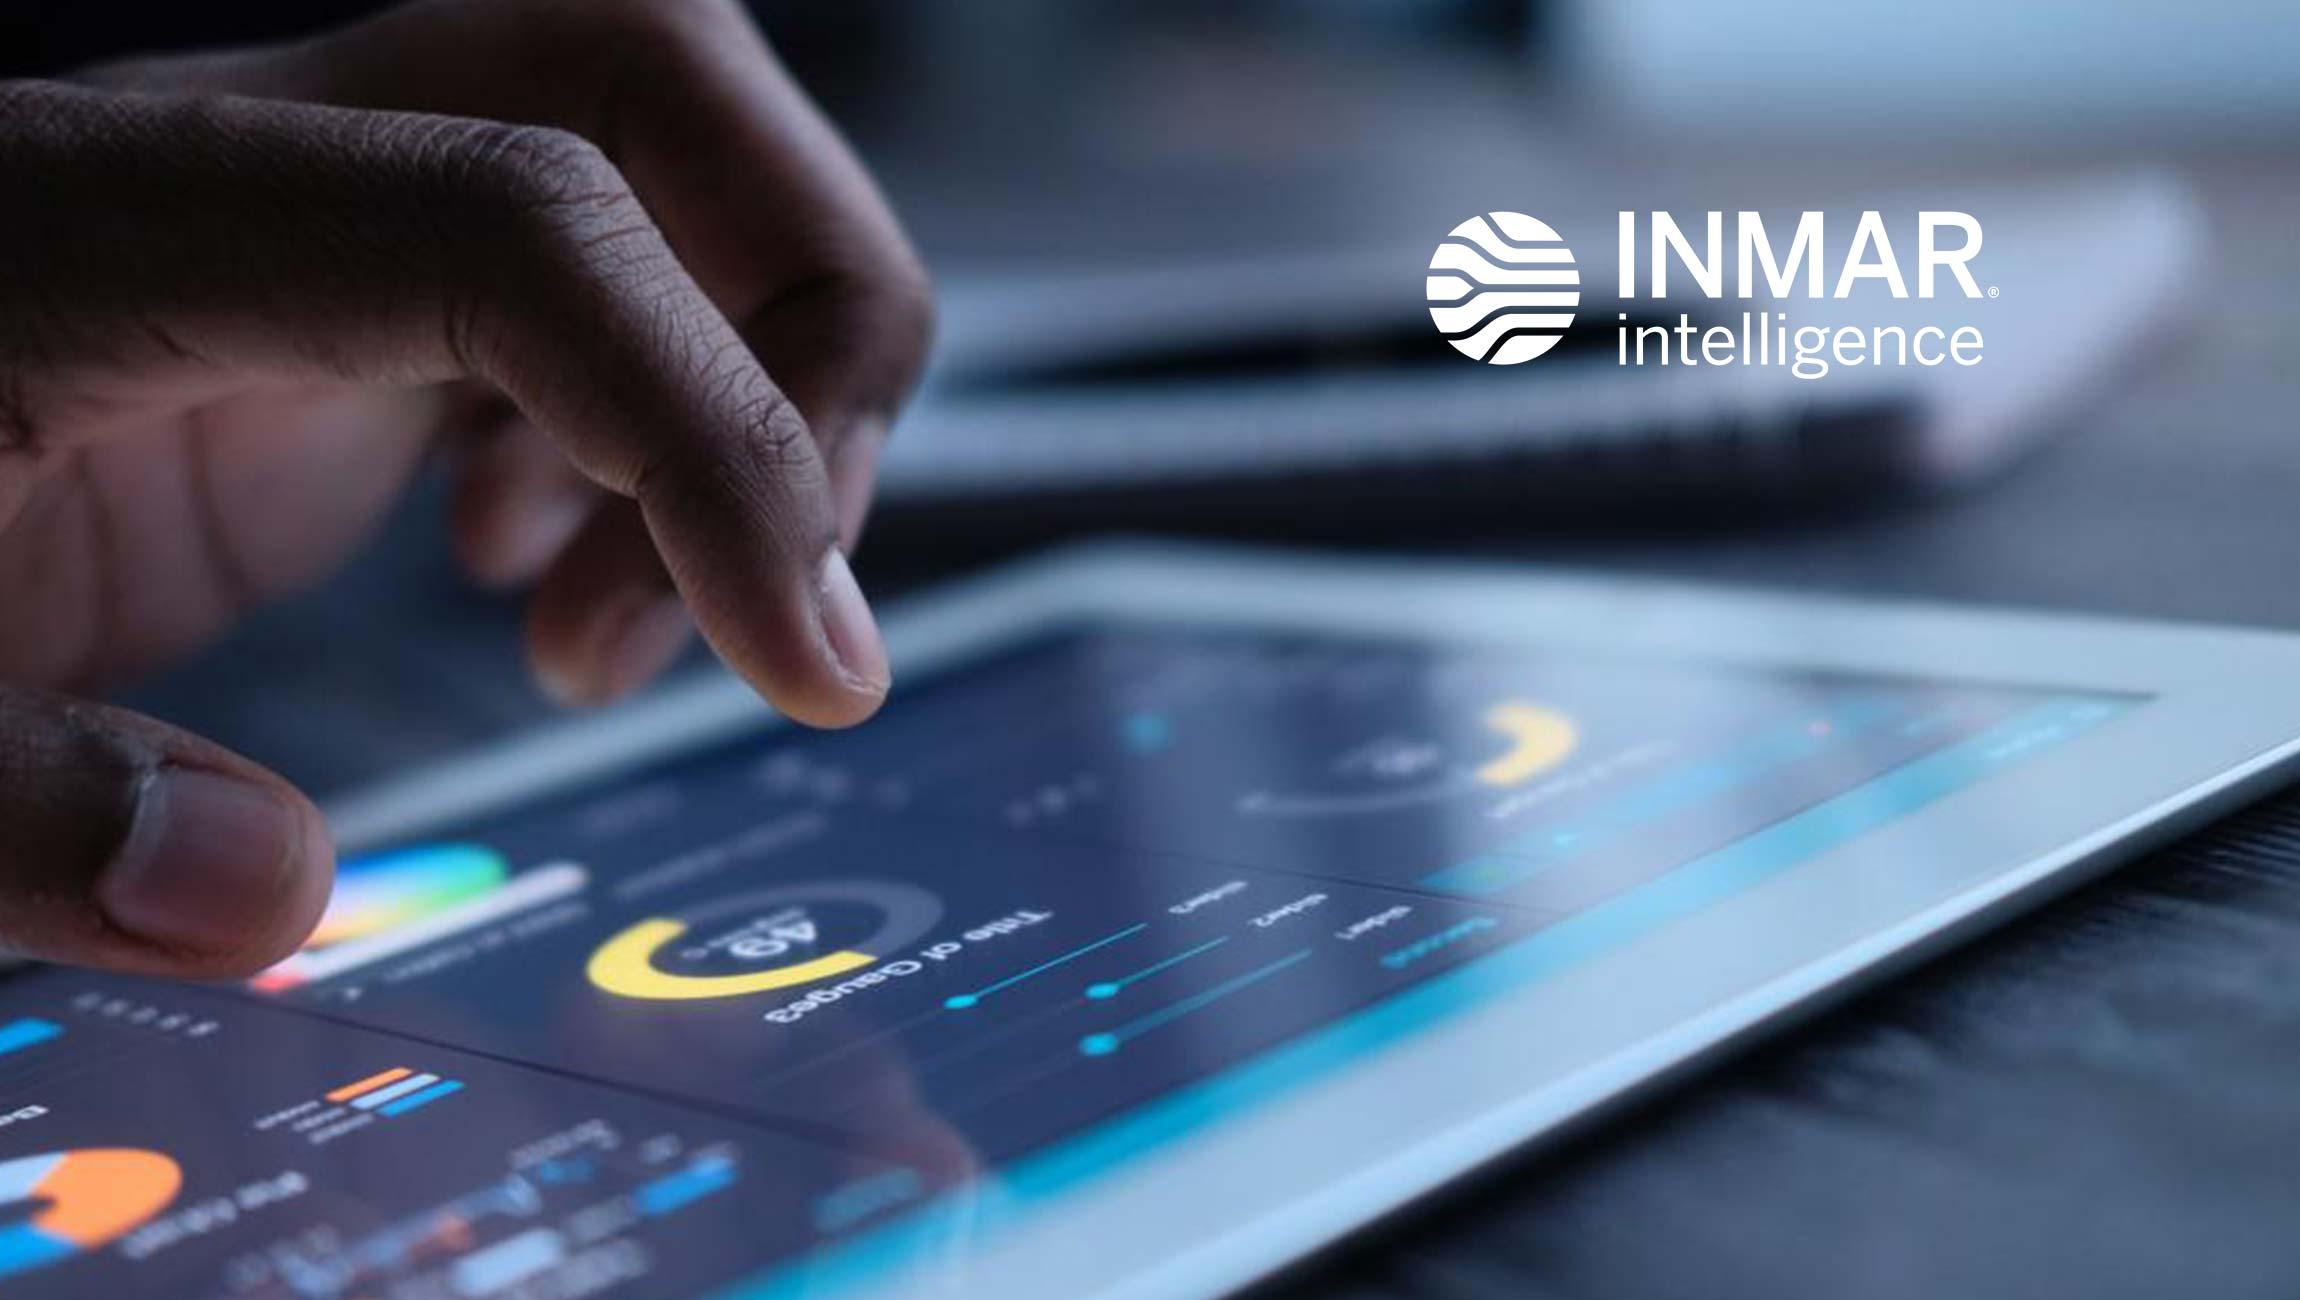 Inmar Intelligence Appoints Retail Industry Veteran Spencer Baird to Transformation Leadership Team